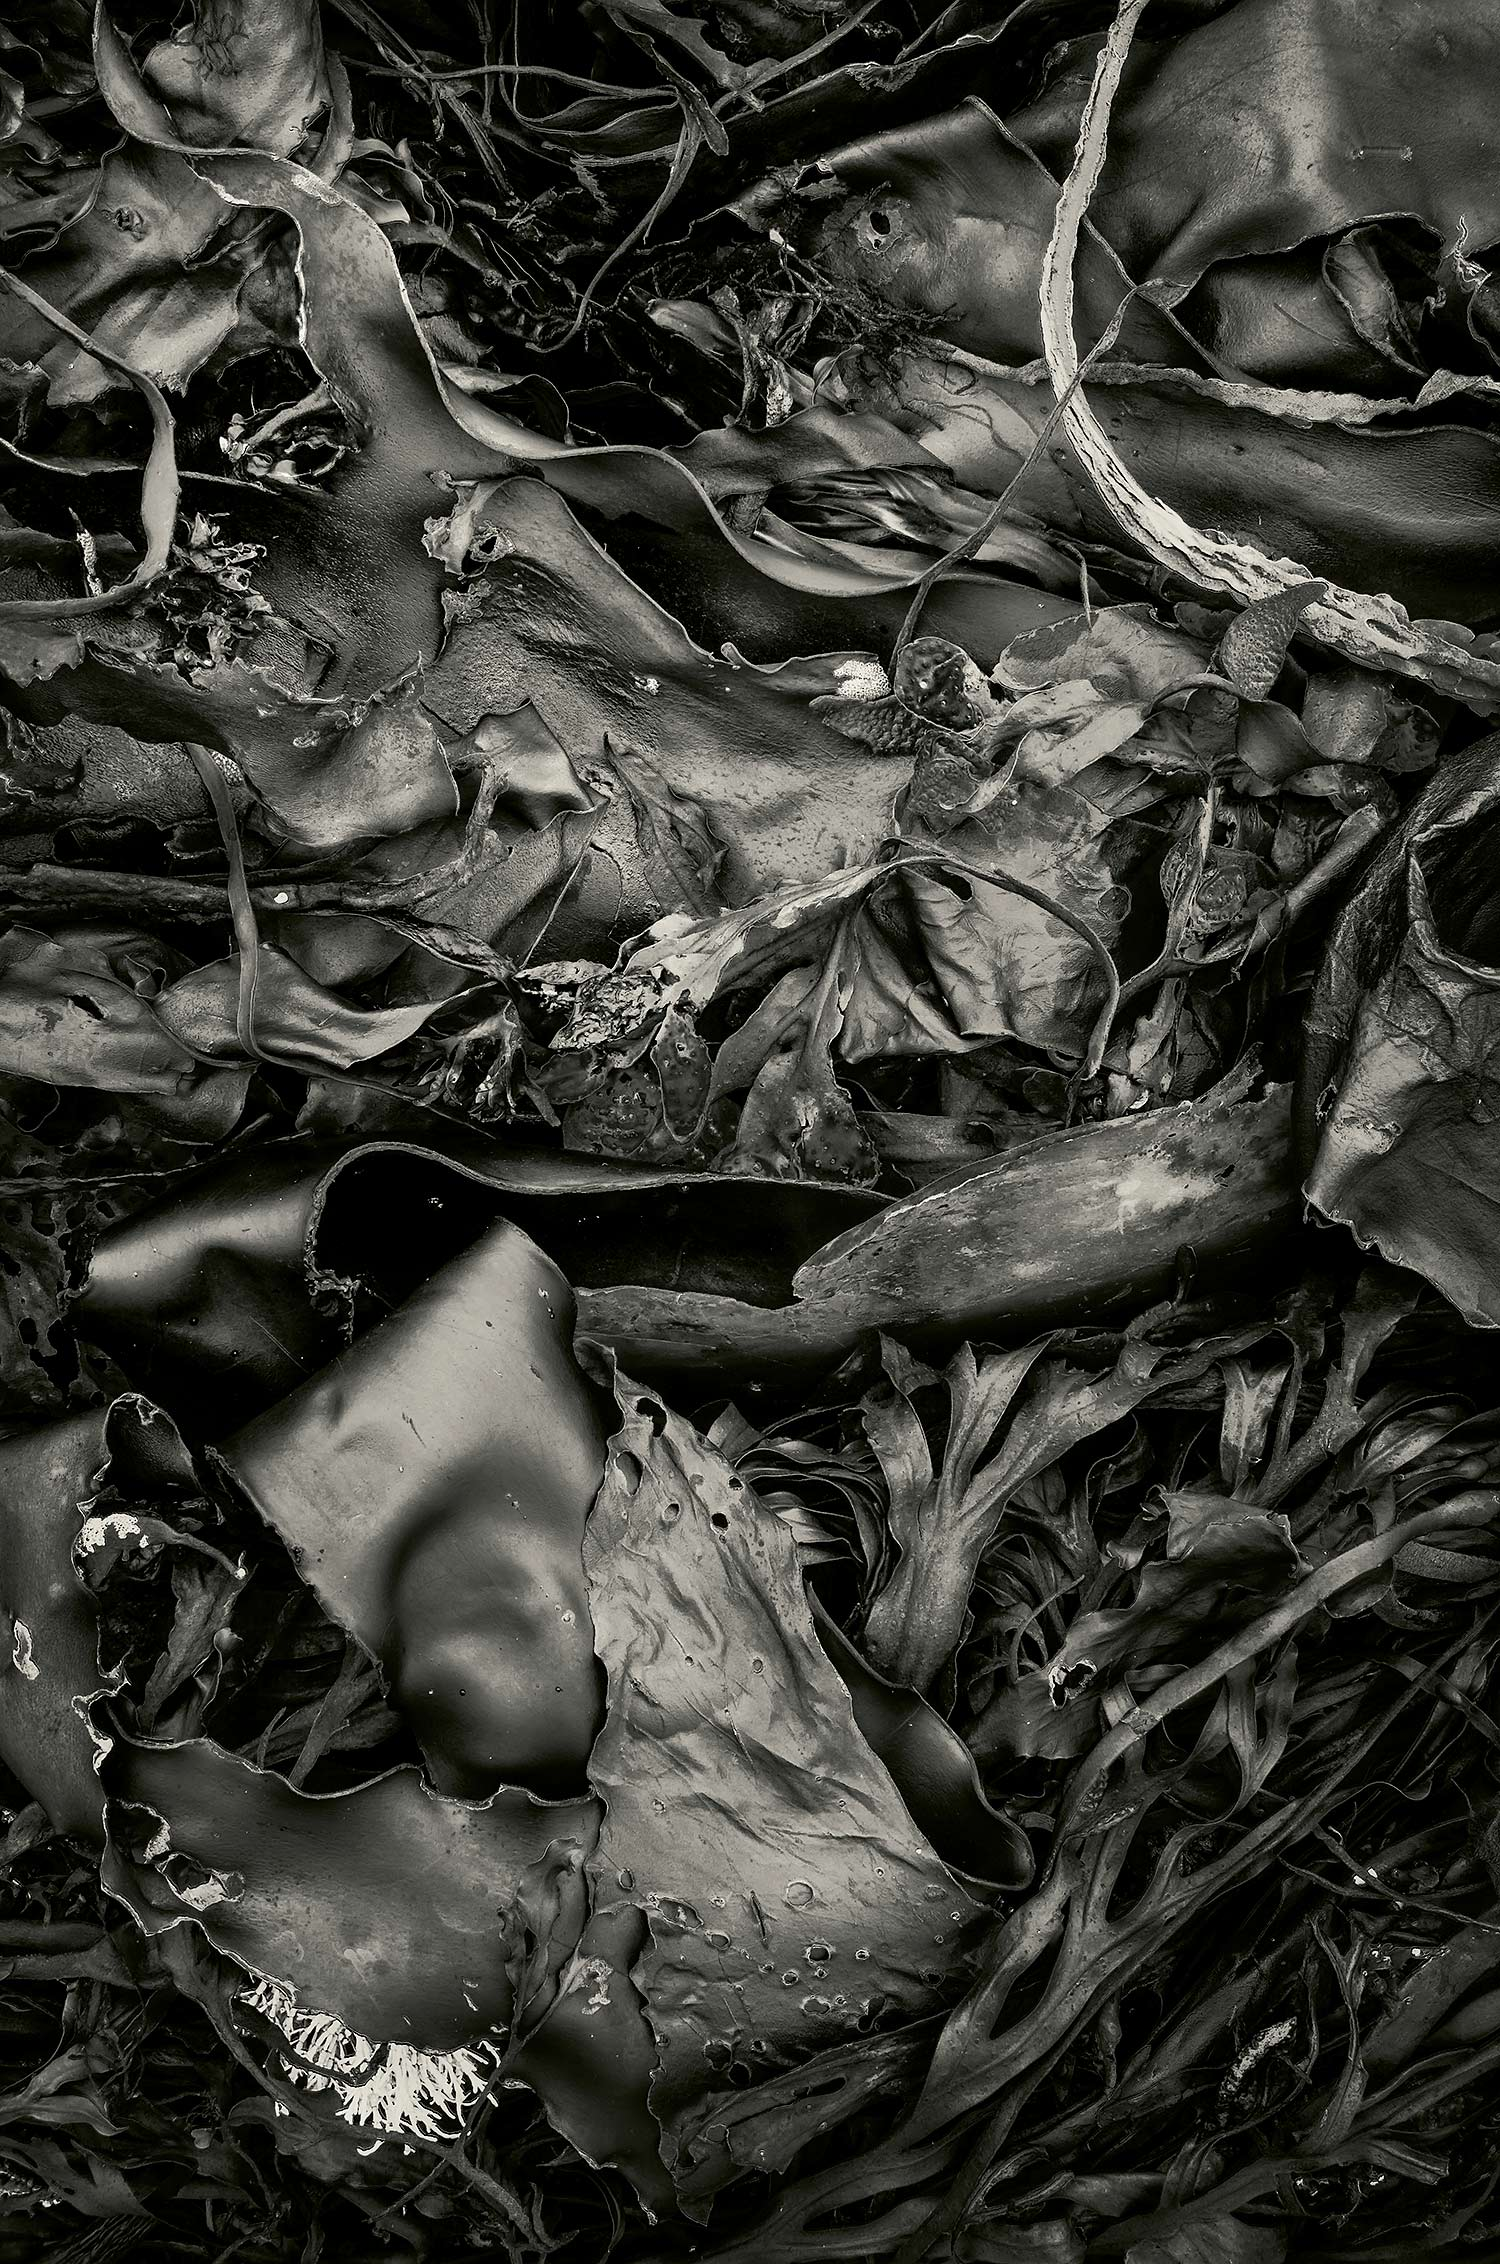 Seaweed 567, Seawall, Maine, 2012